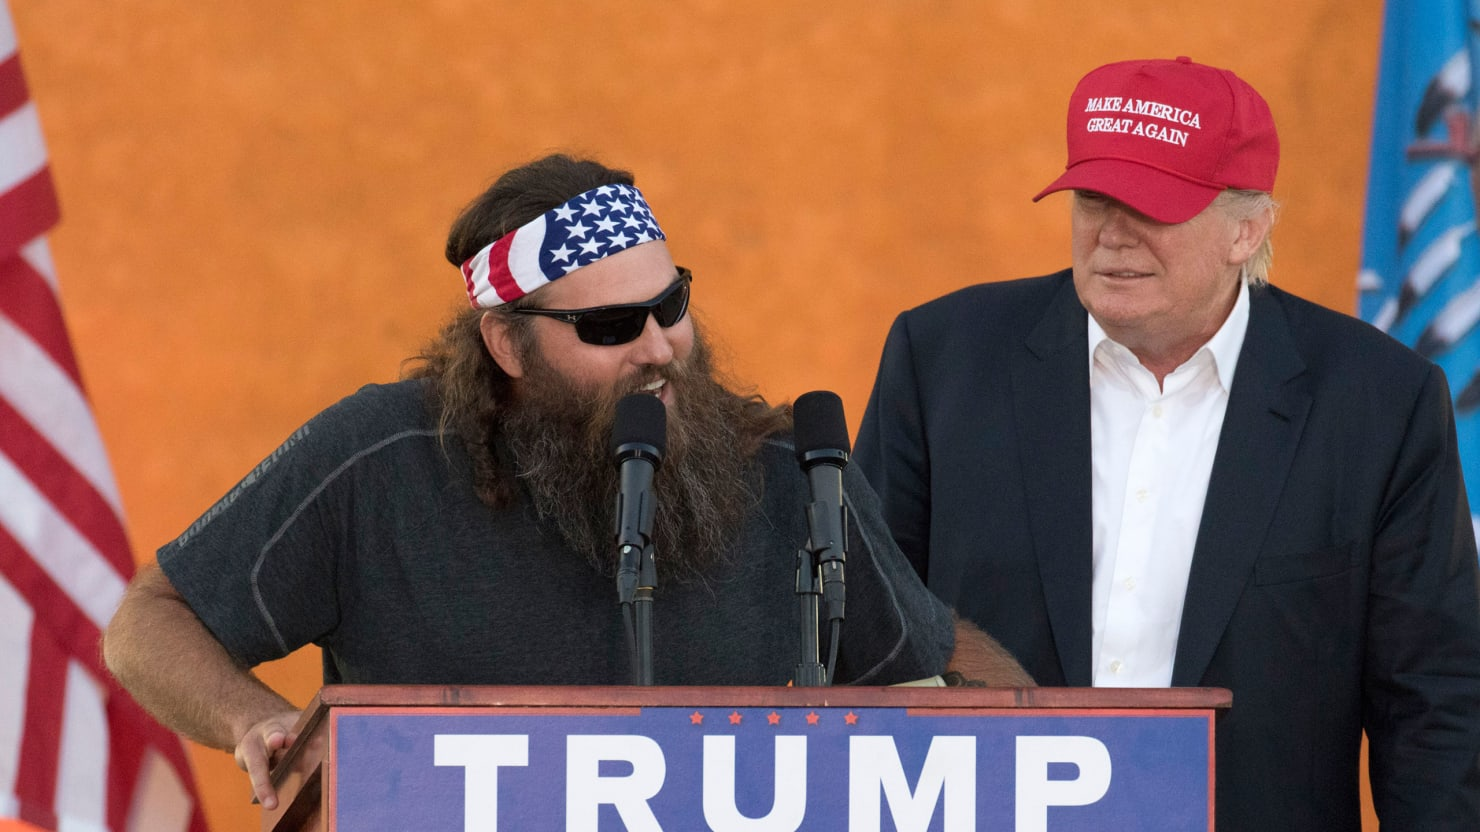 Trump Facial Hair